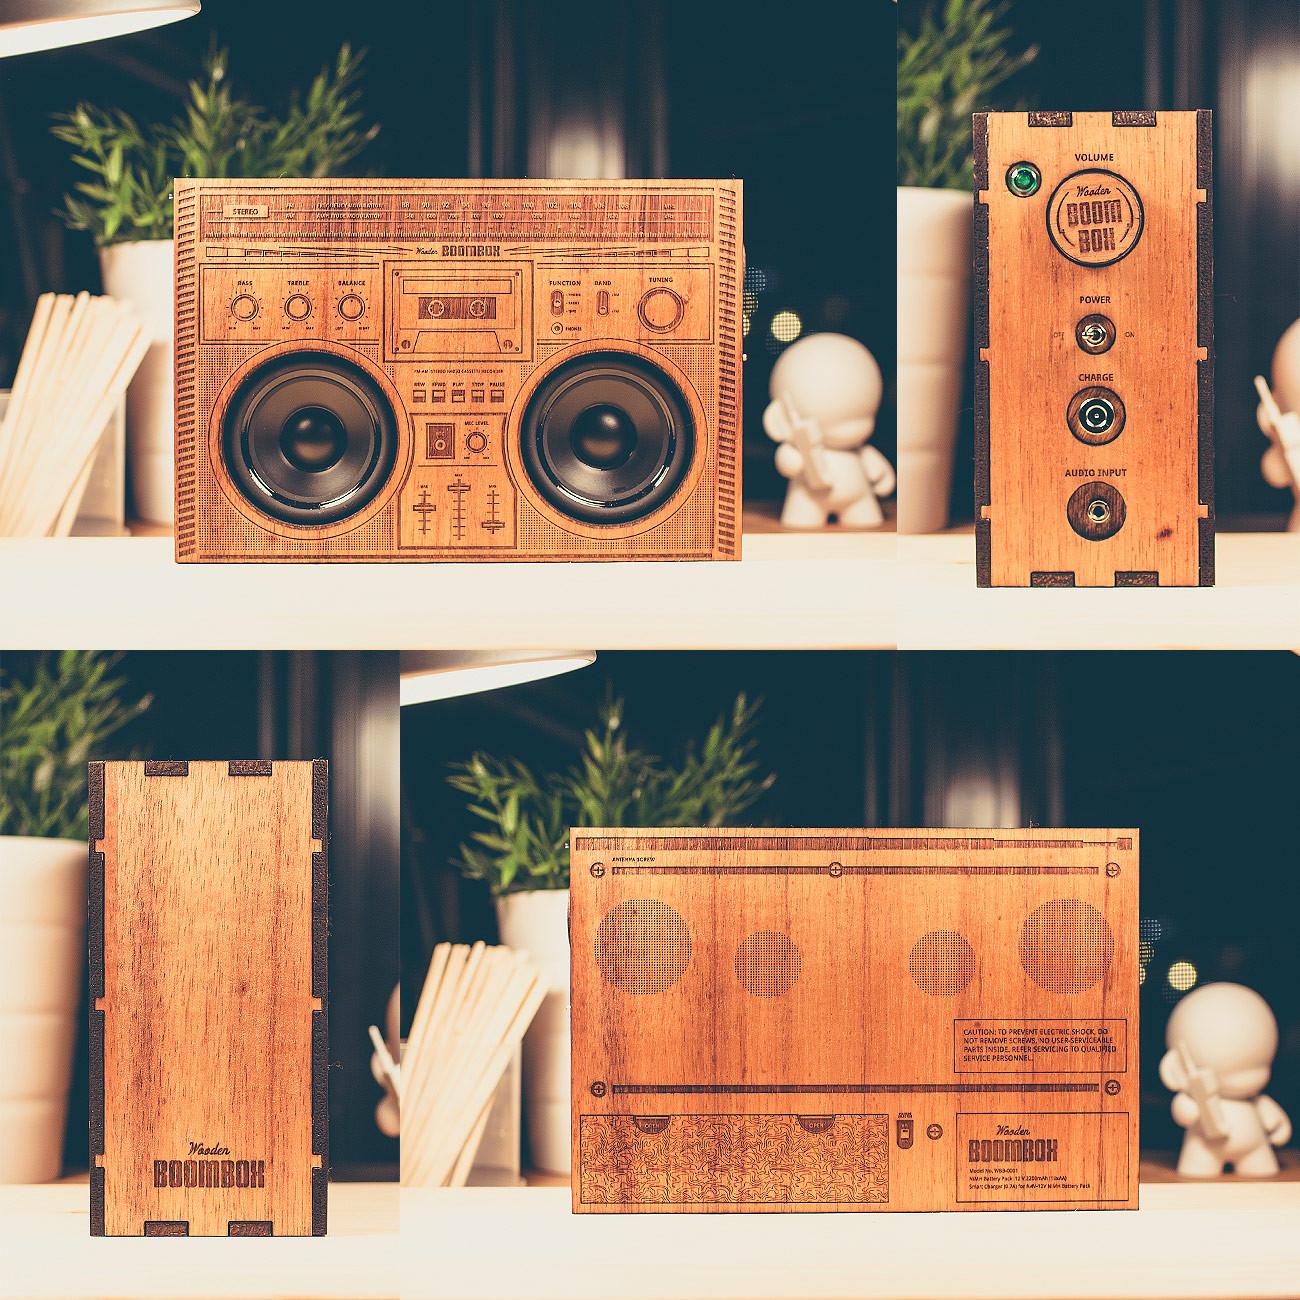 wooden-boombox-jake-mize-1300